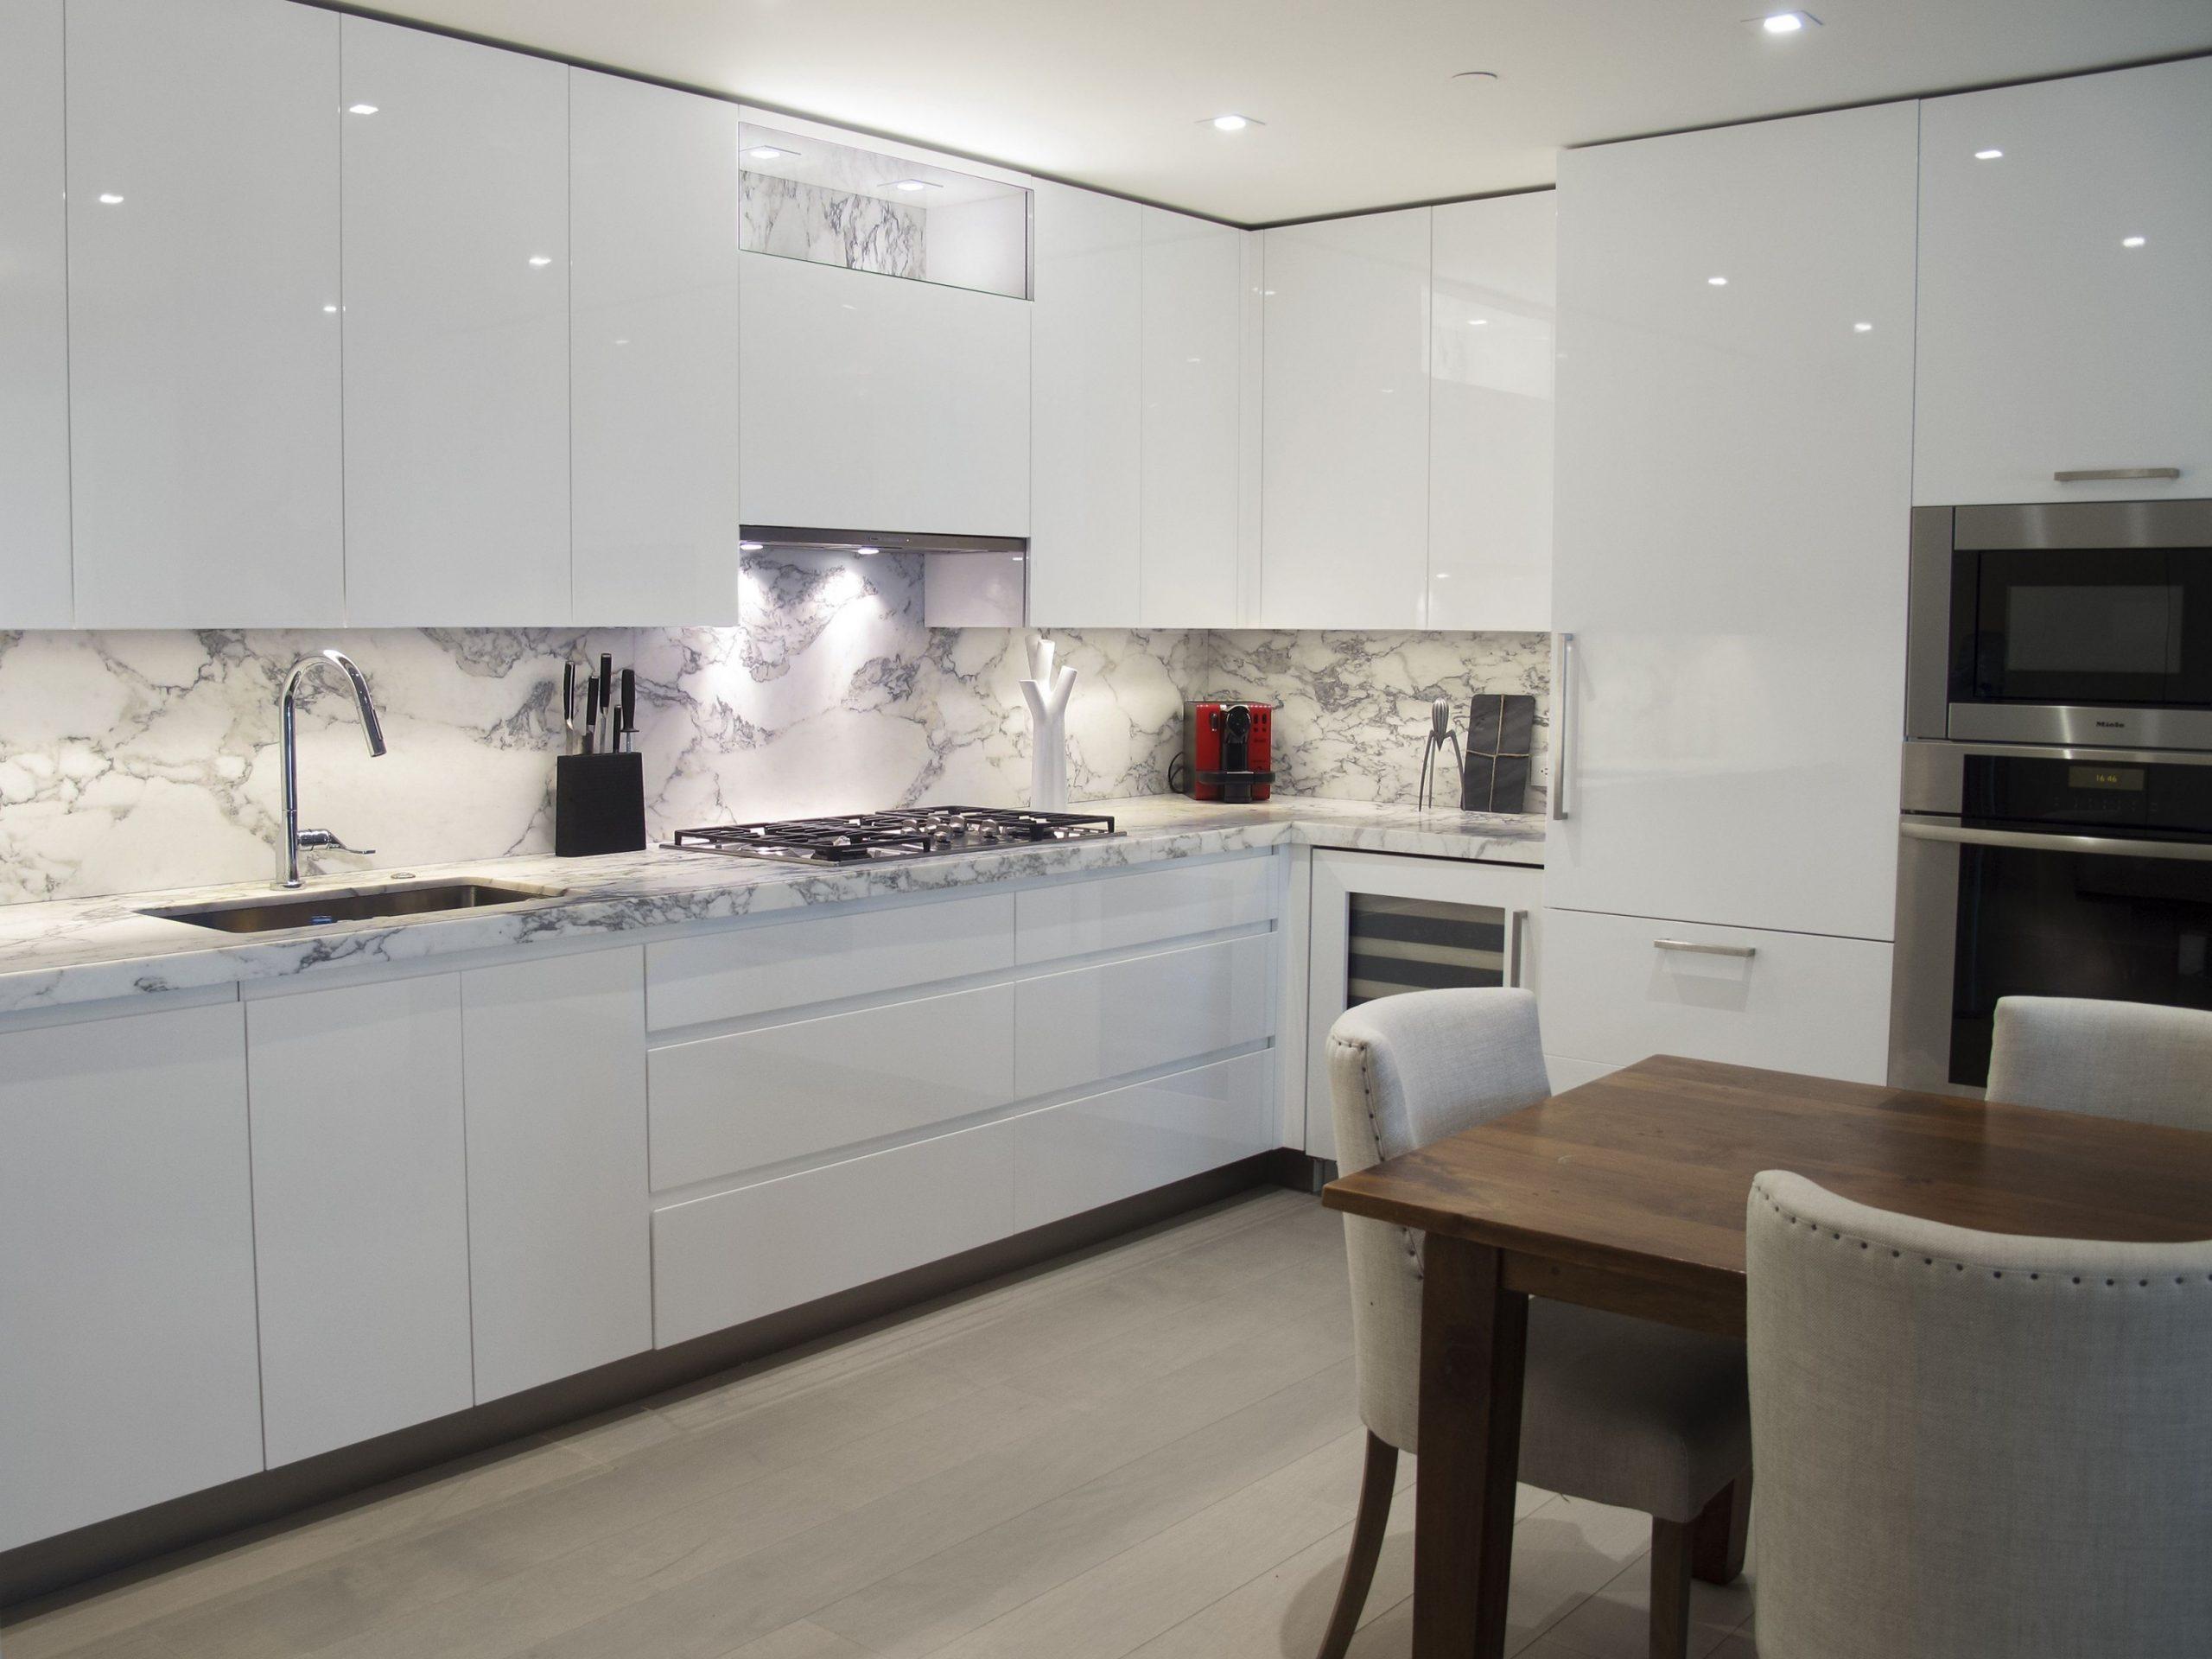 Custom Kitchen Design - White high-gloss handle-less cabinetry  - Kitchen Cabinets Gloss White